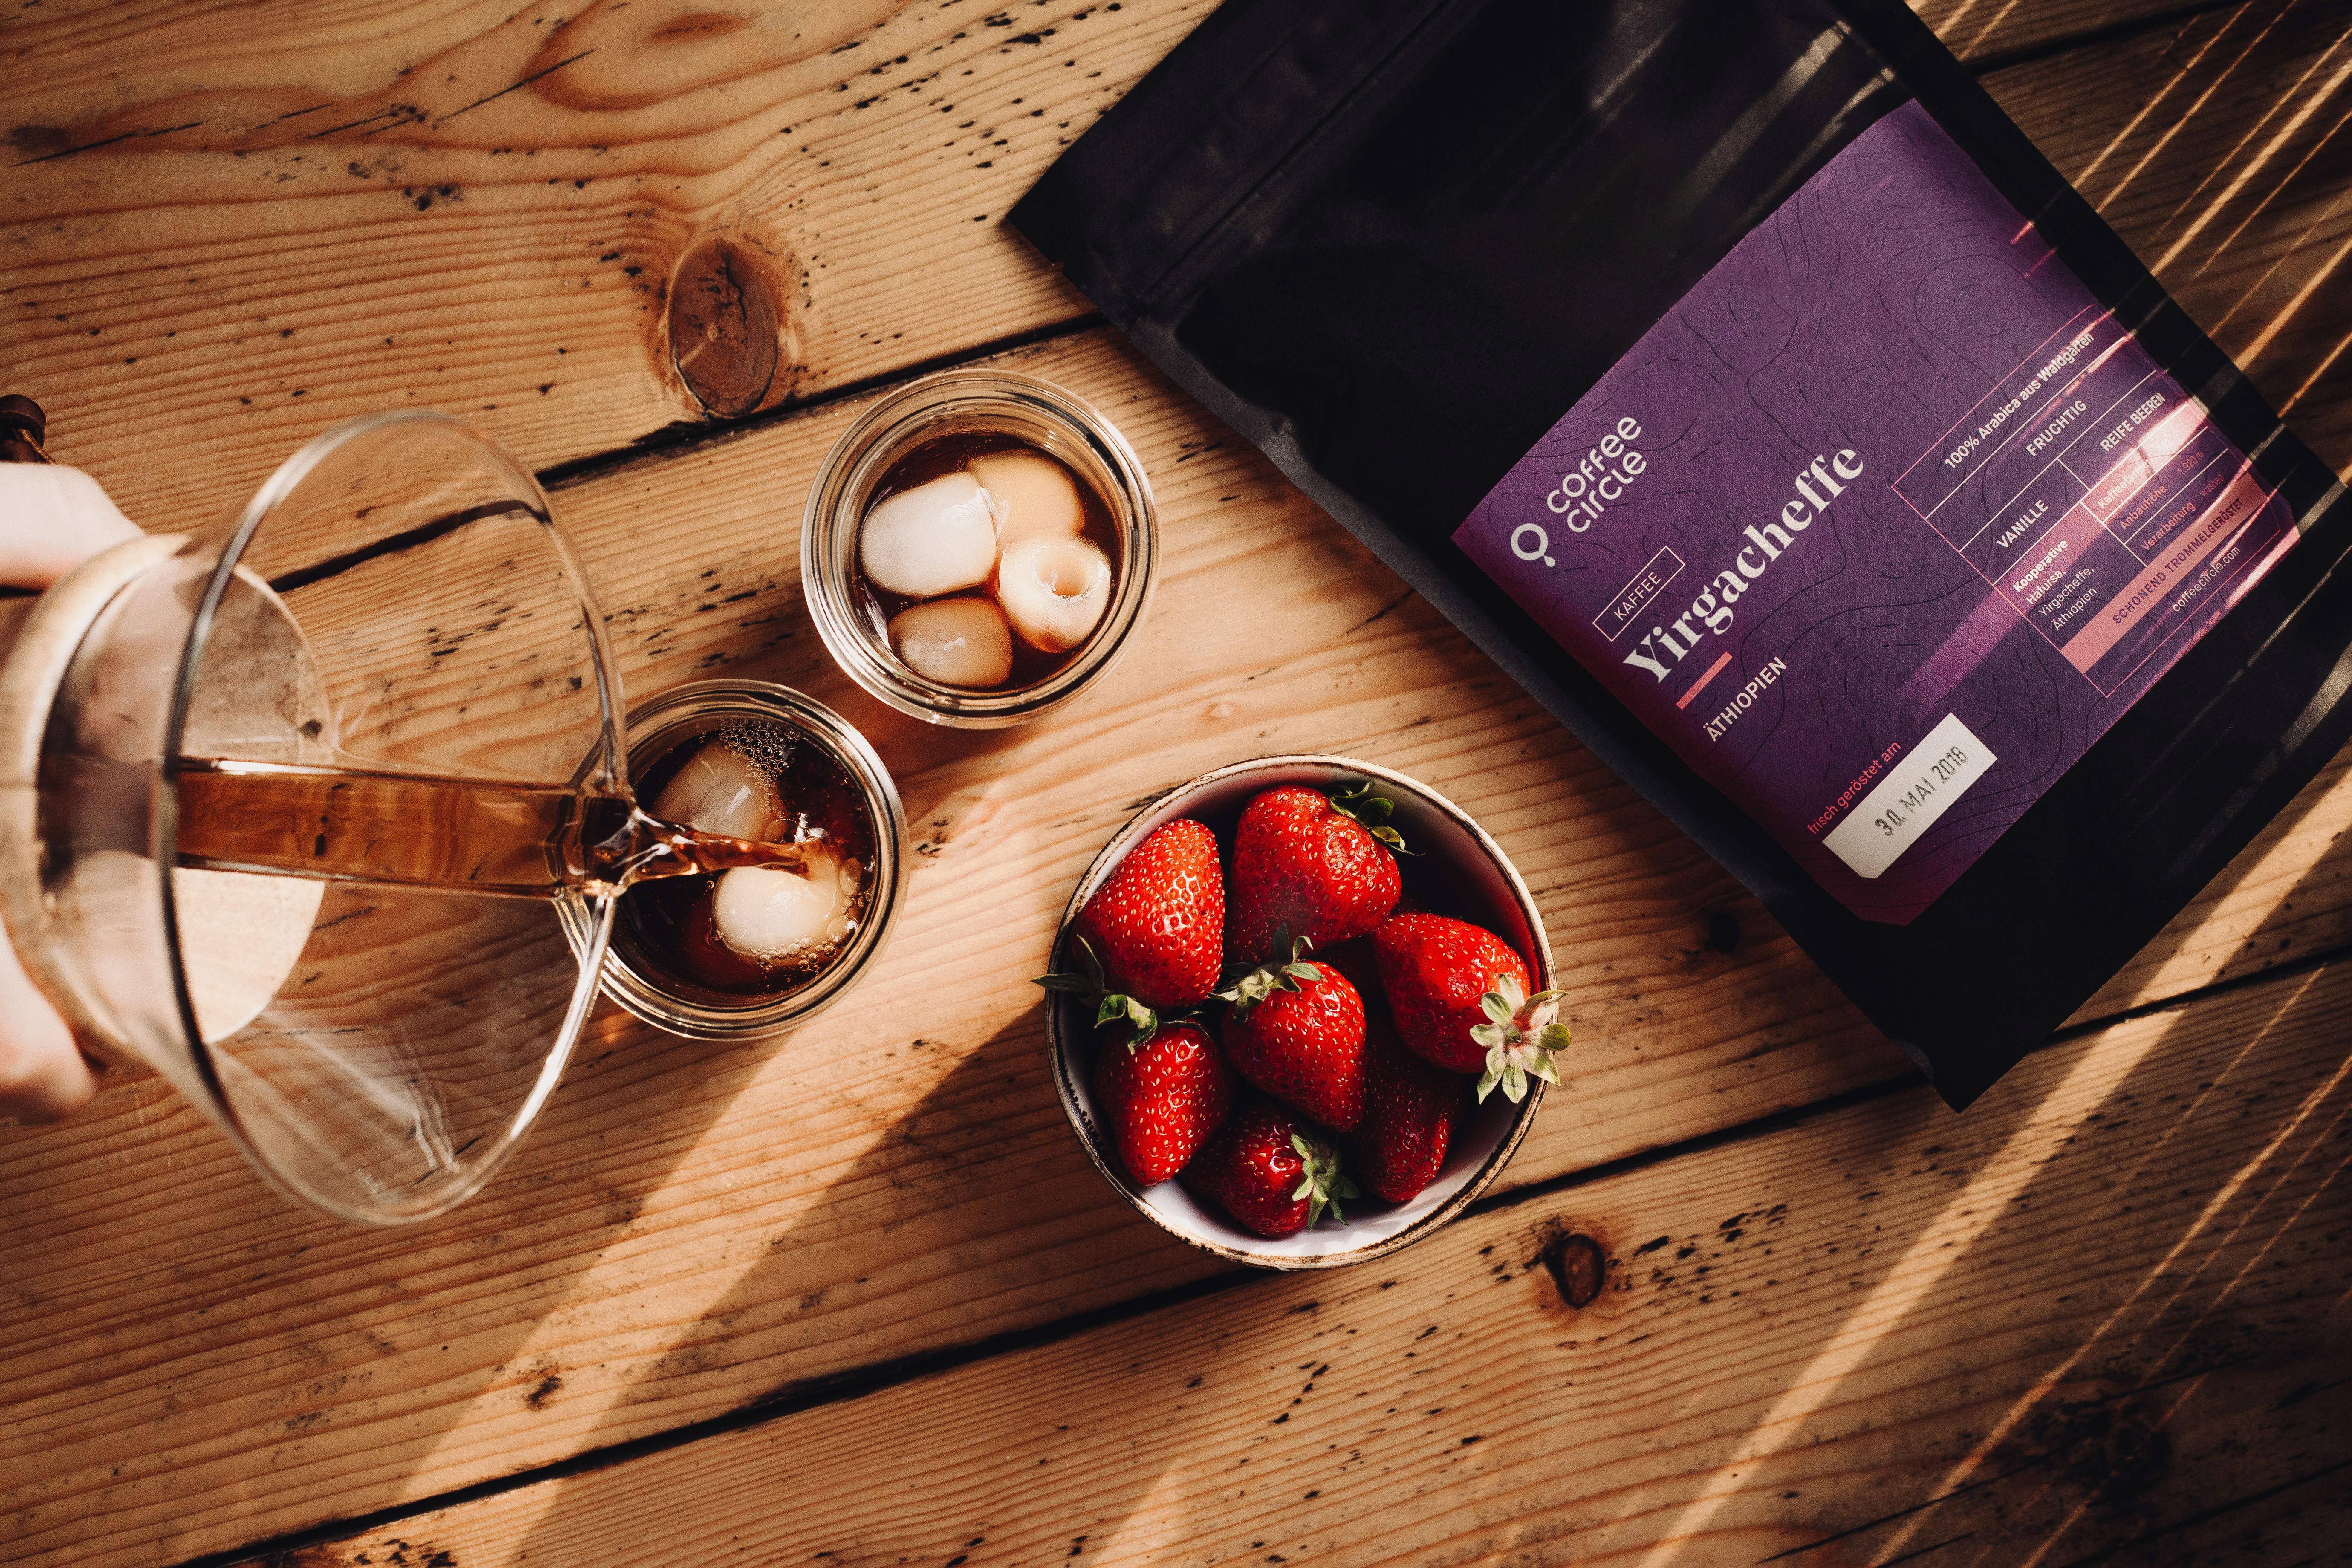 Yirgacheffe Kaffee als Cold Brew im Sommer